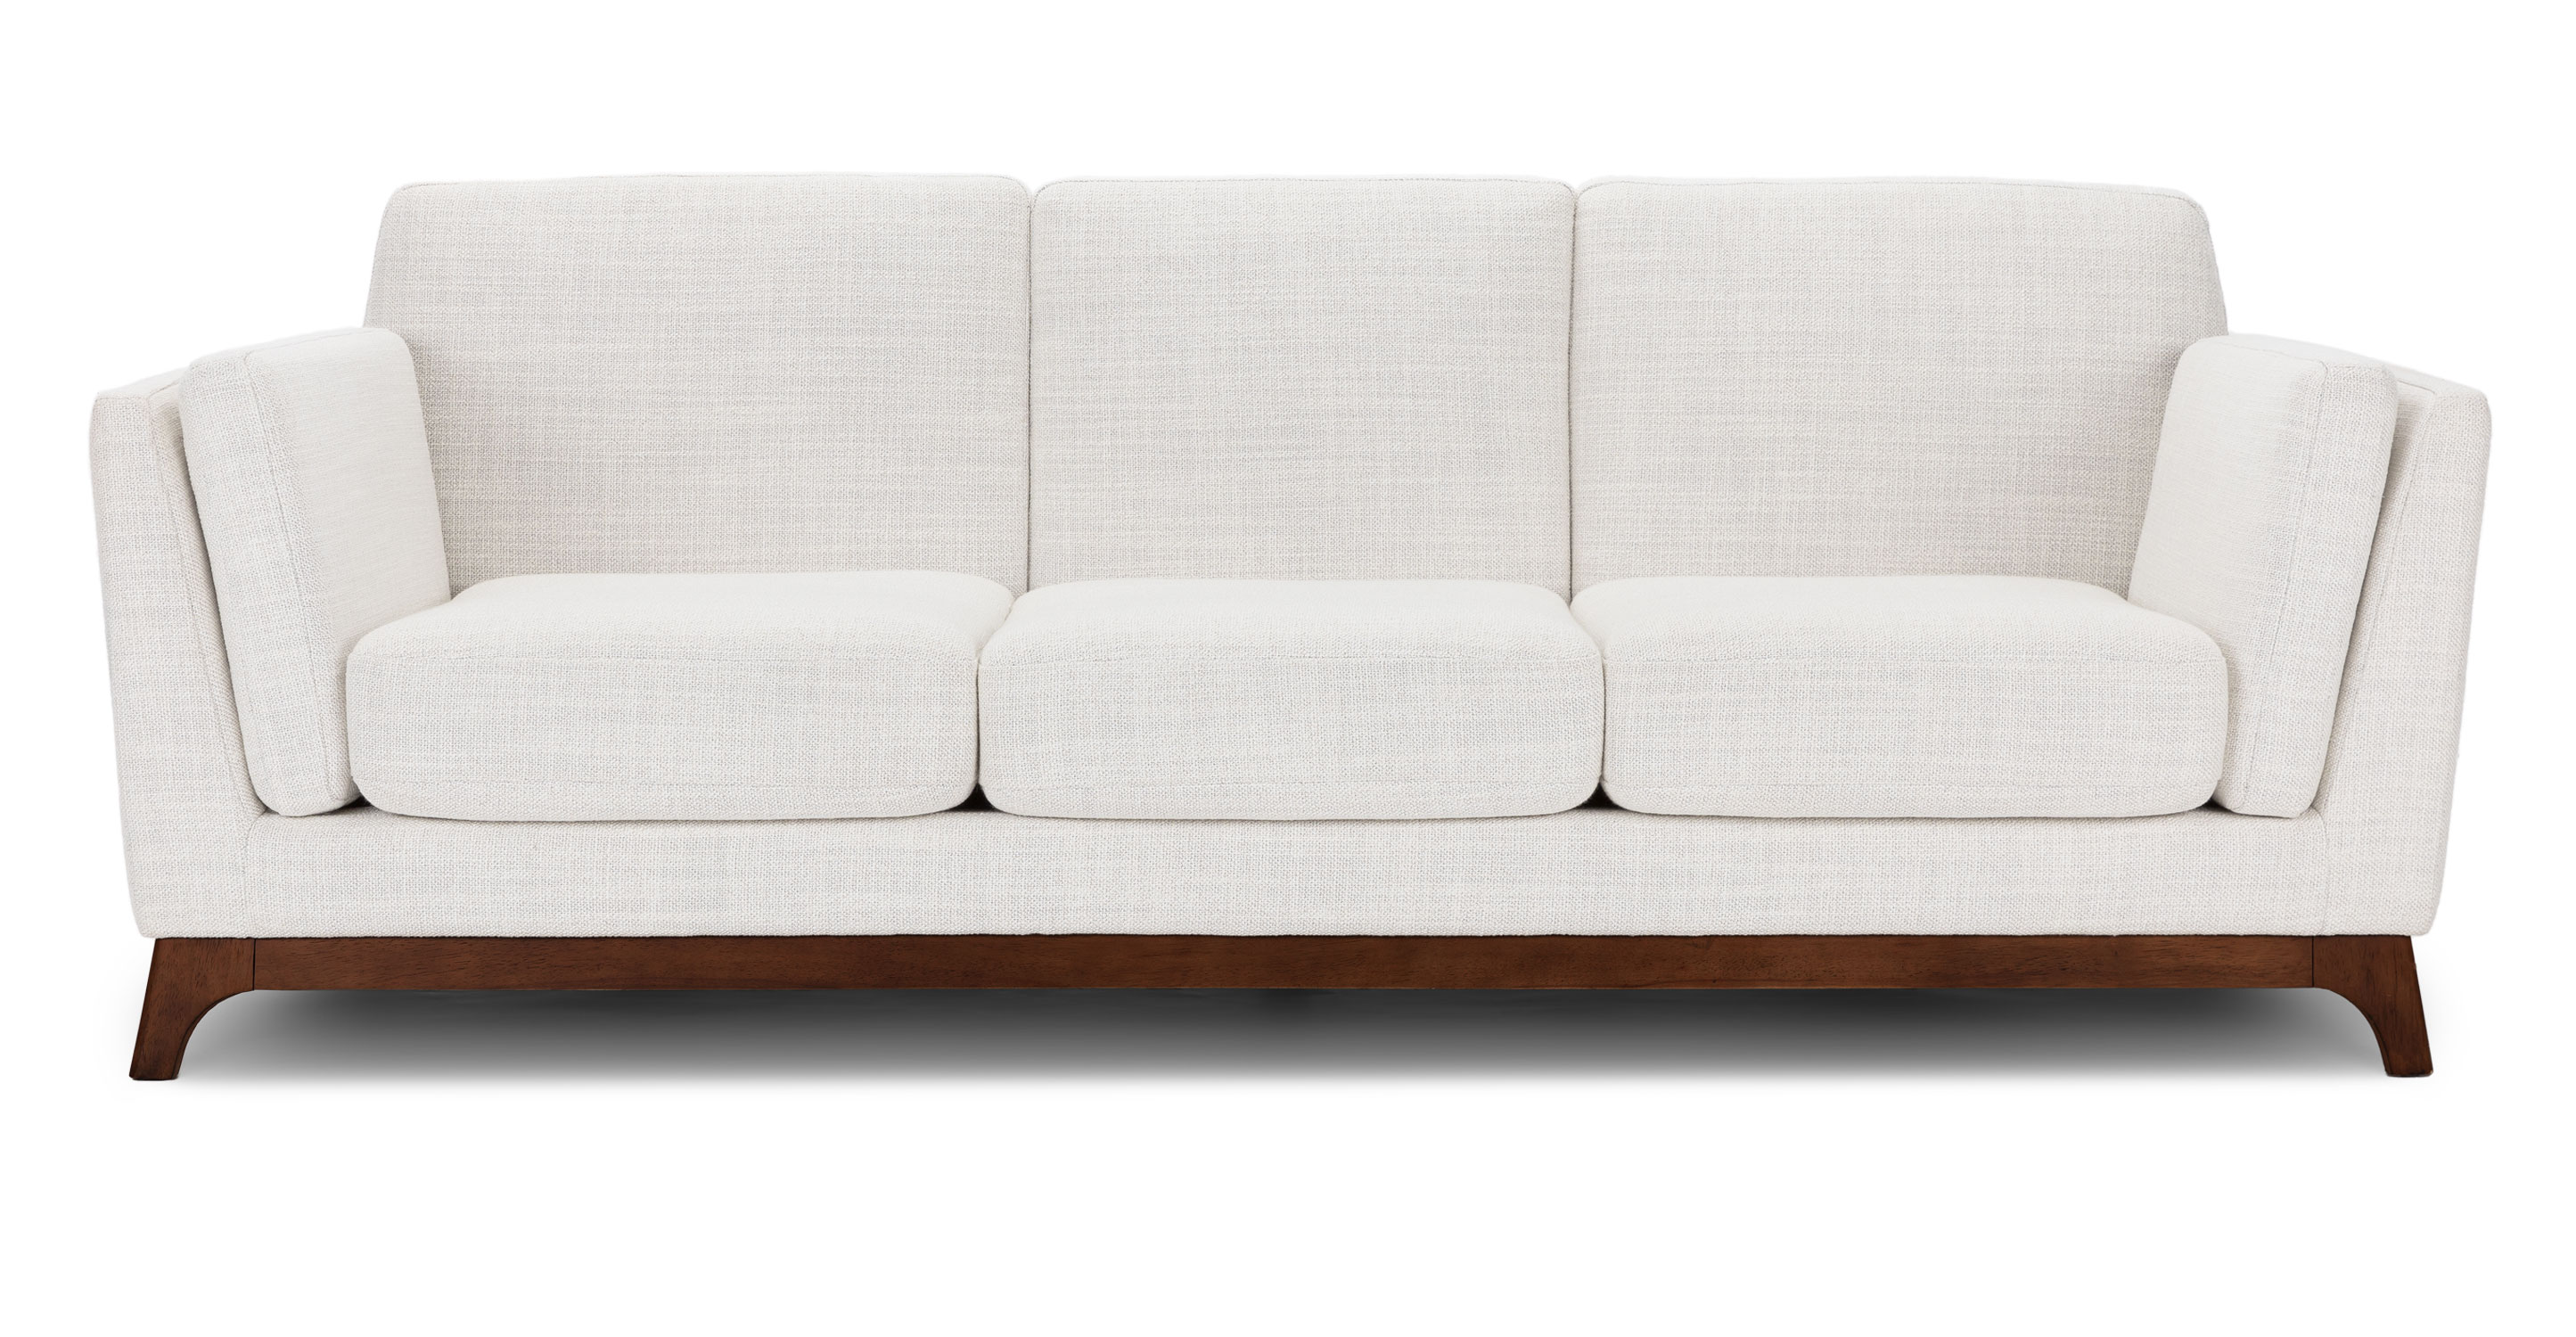 ceni fresh white sofa - sofas - article | modern, mid-century and TTKLDMQ